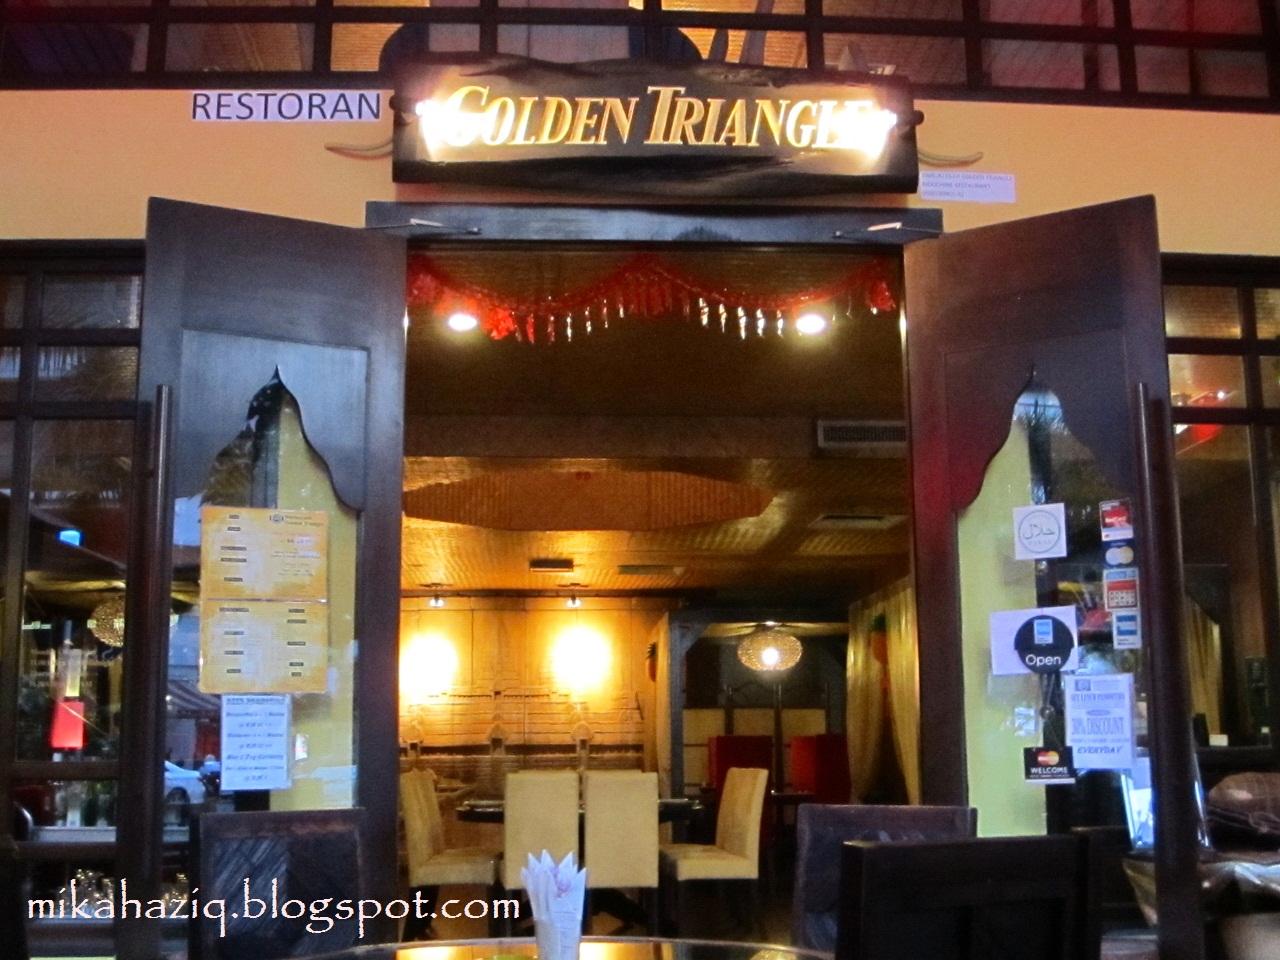 Mikahaziq thai restaurant in kuala lumpur golden